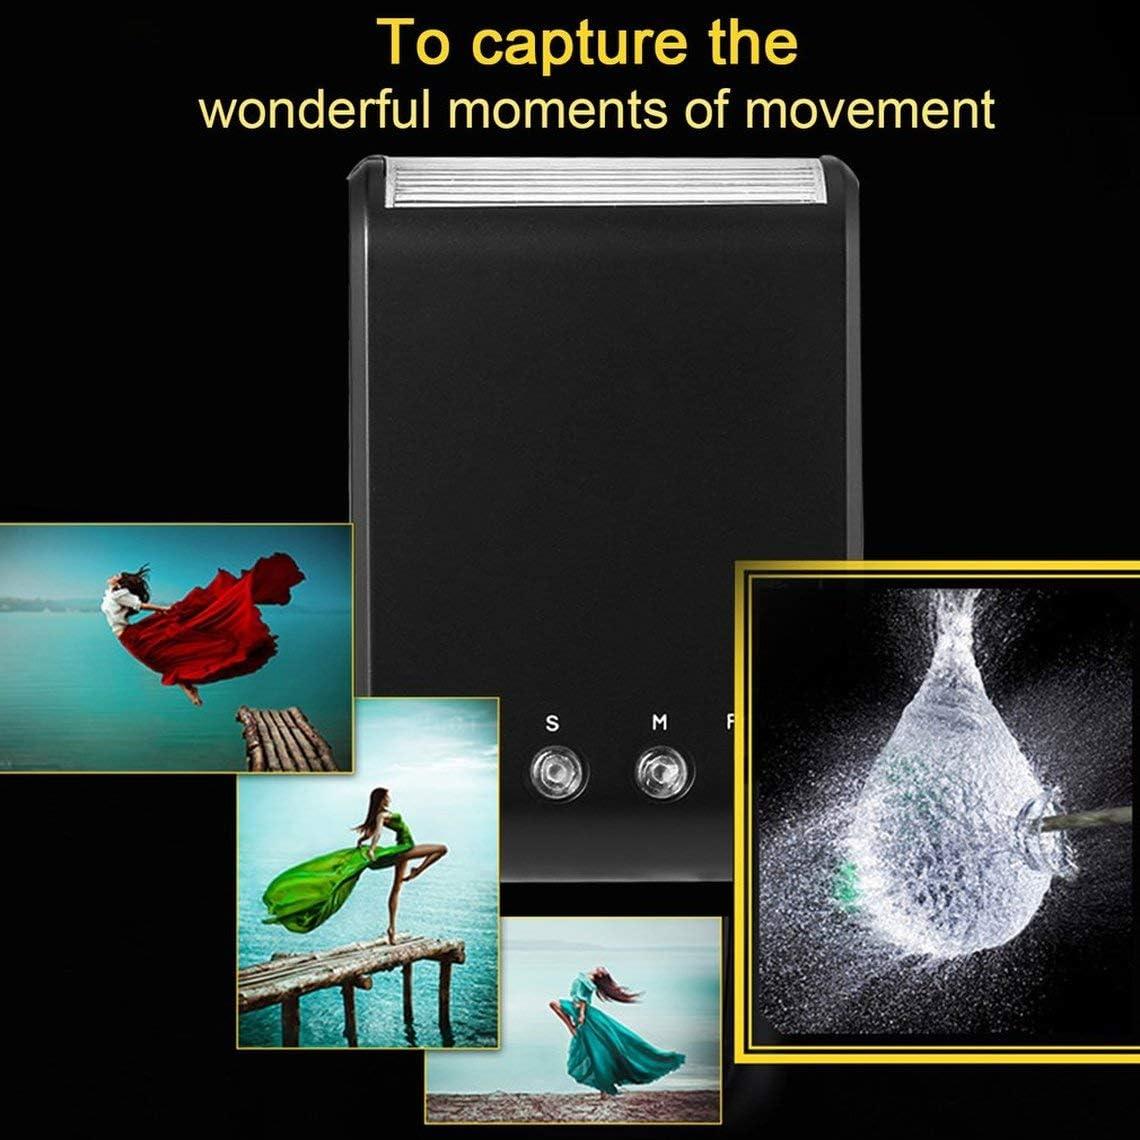 Newest Digital Slave Flash Light Auto Single Contact Standard for Hotshoe Camera Digital Hot